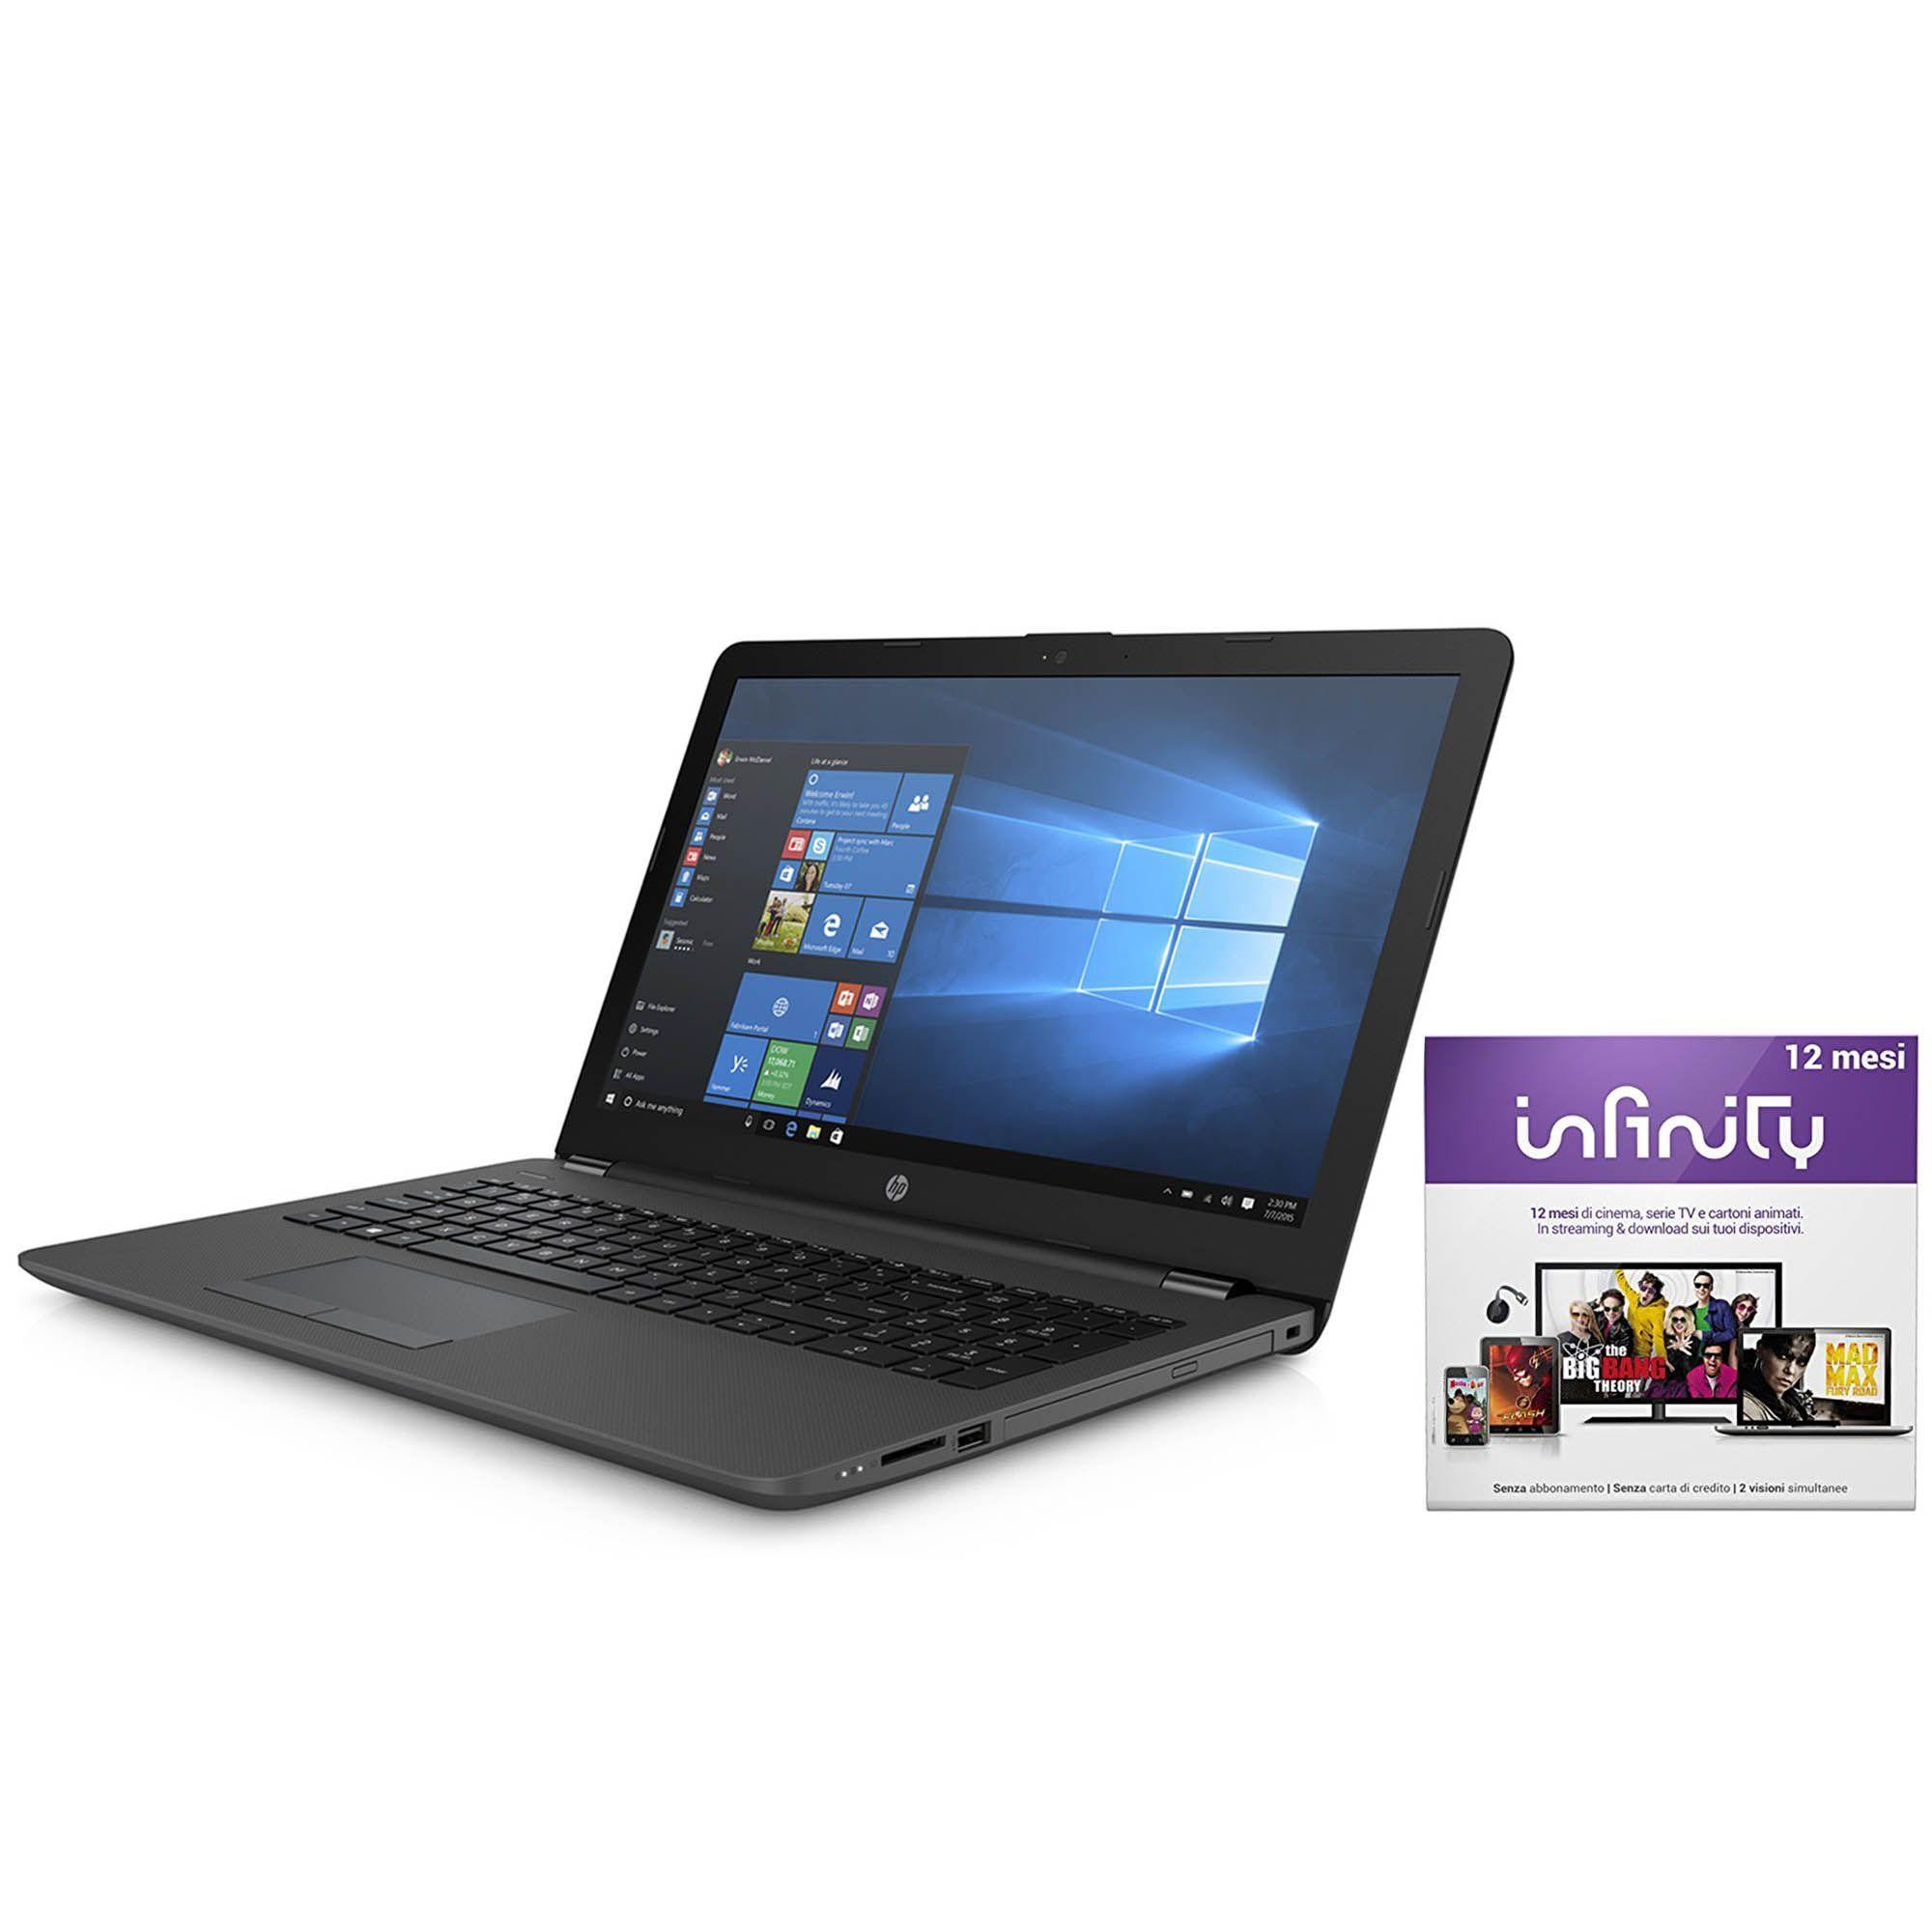 HP 250 G6 3QM76EA Notebook 15.6